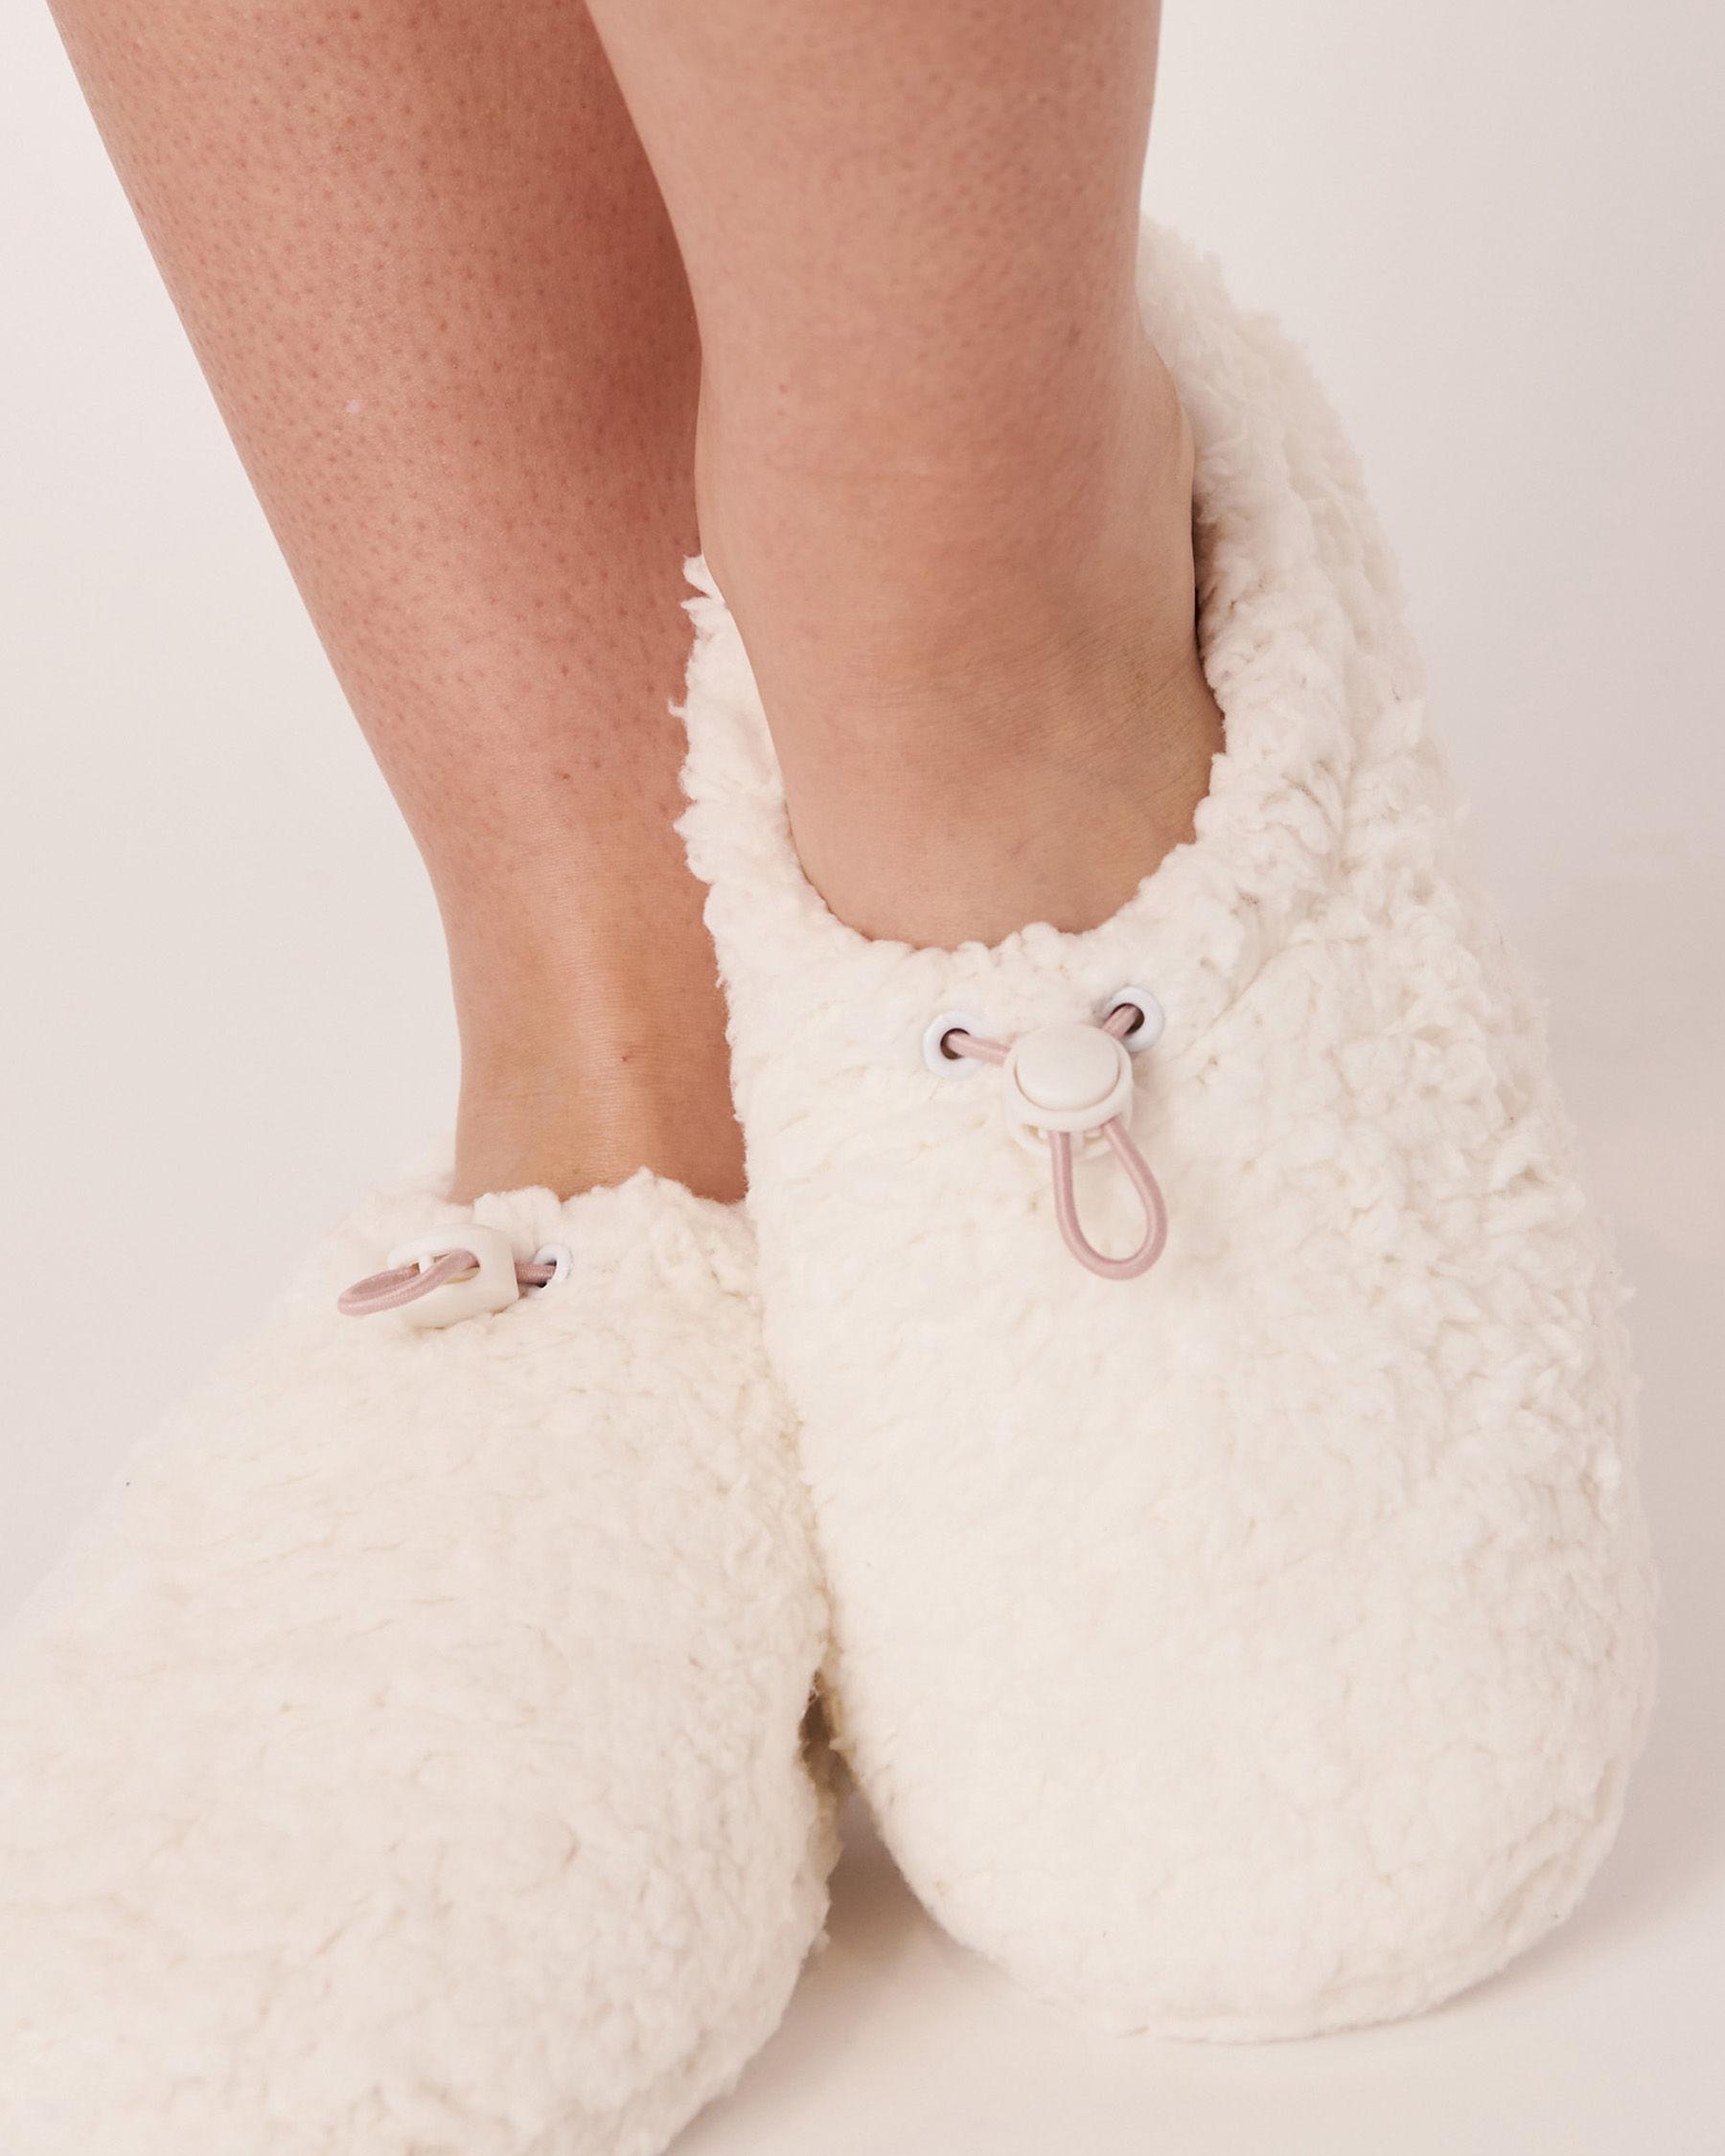 LA VIE EN ROSE Sherpa Bootie Slippers White 40700070 - View1